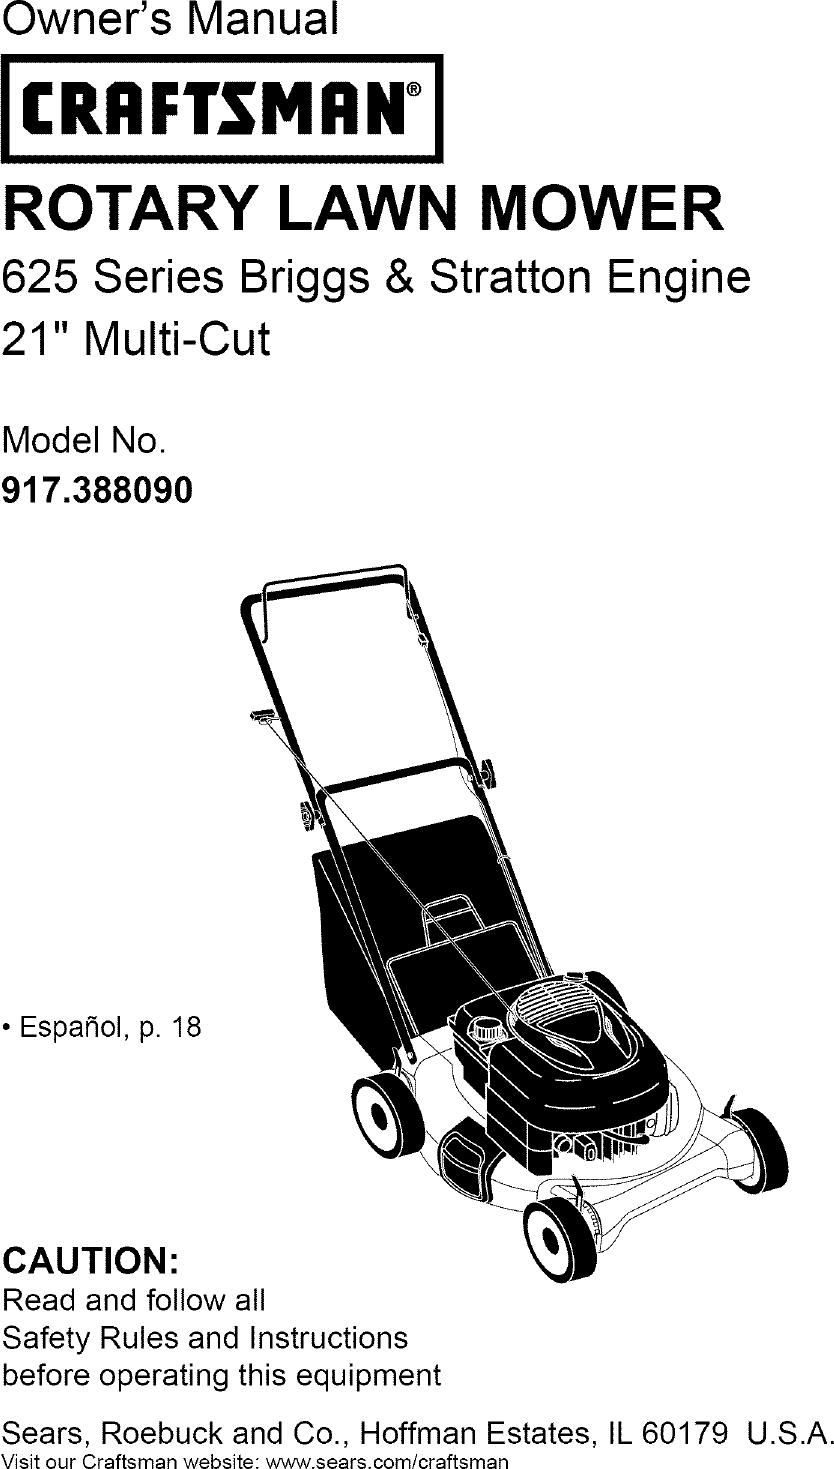 Craftsman 917388090 User Manual LAWN MOWER Manuals And